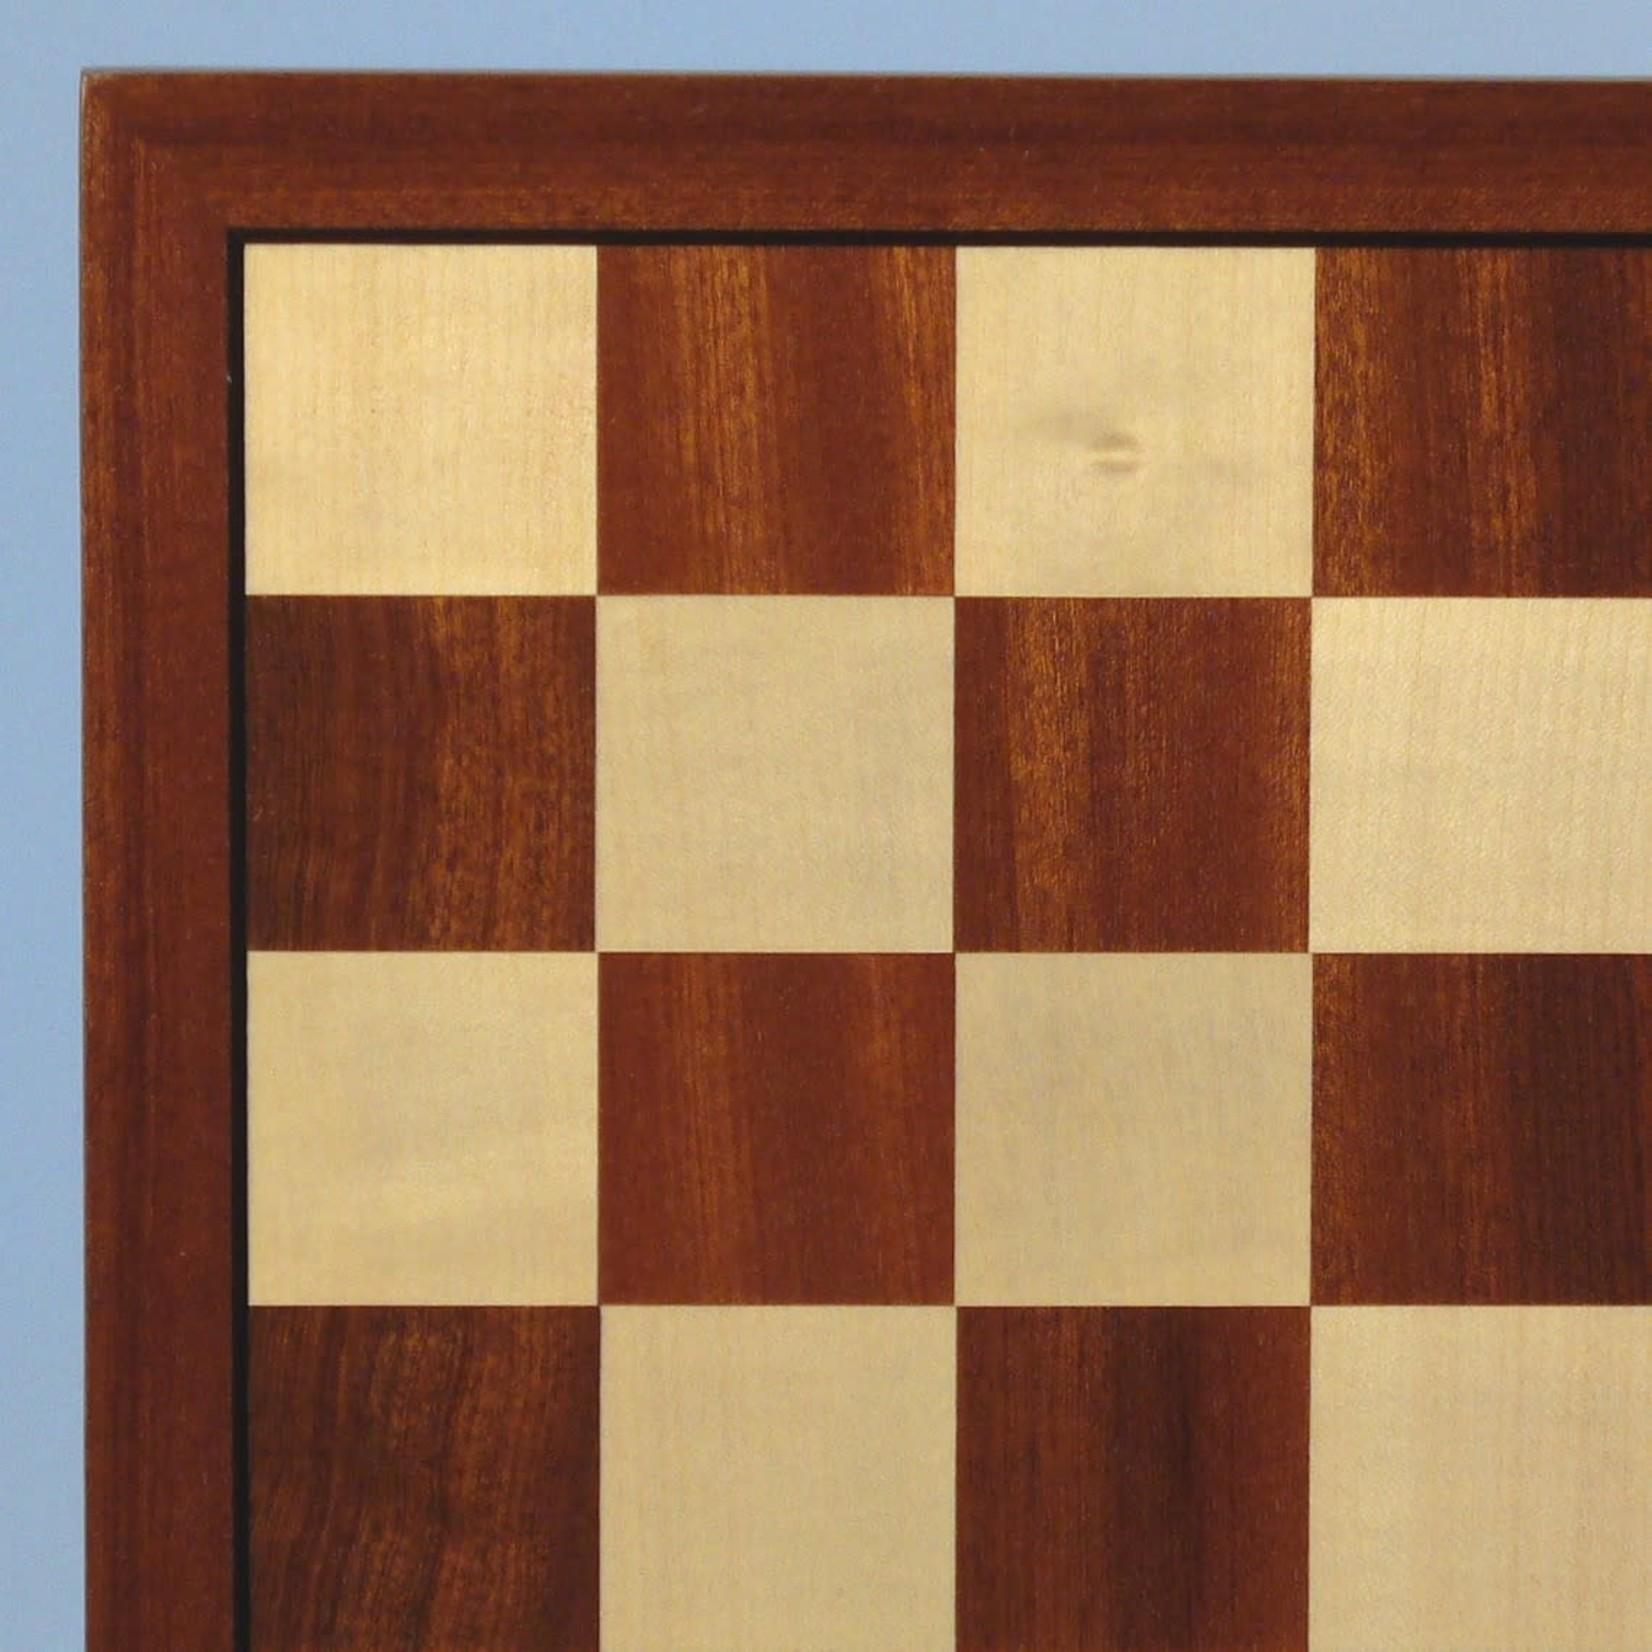 "WorldWise Imports Chess Board - Sapele/Maple 15.75"" board"